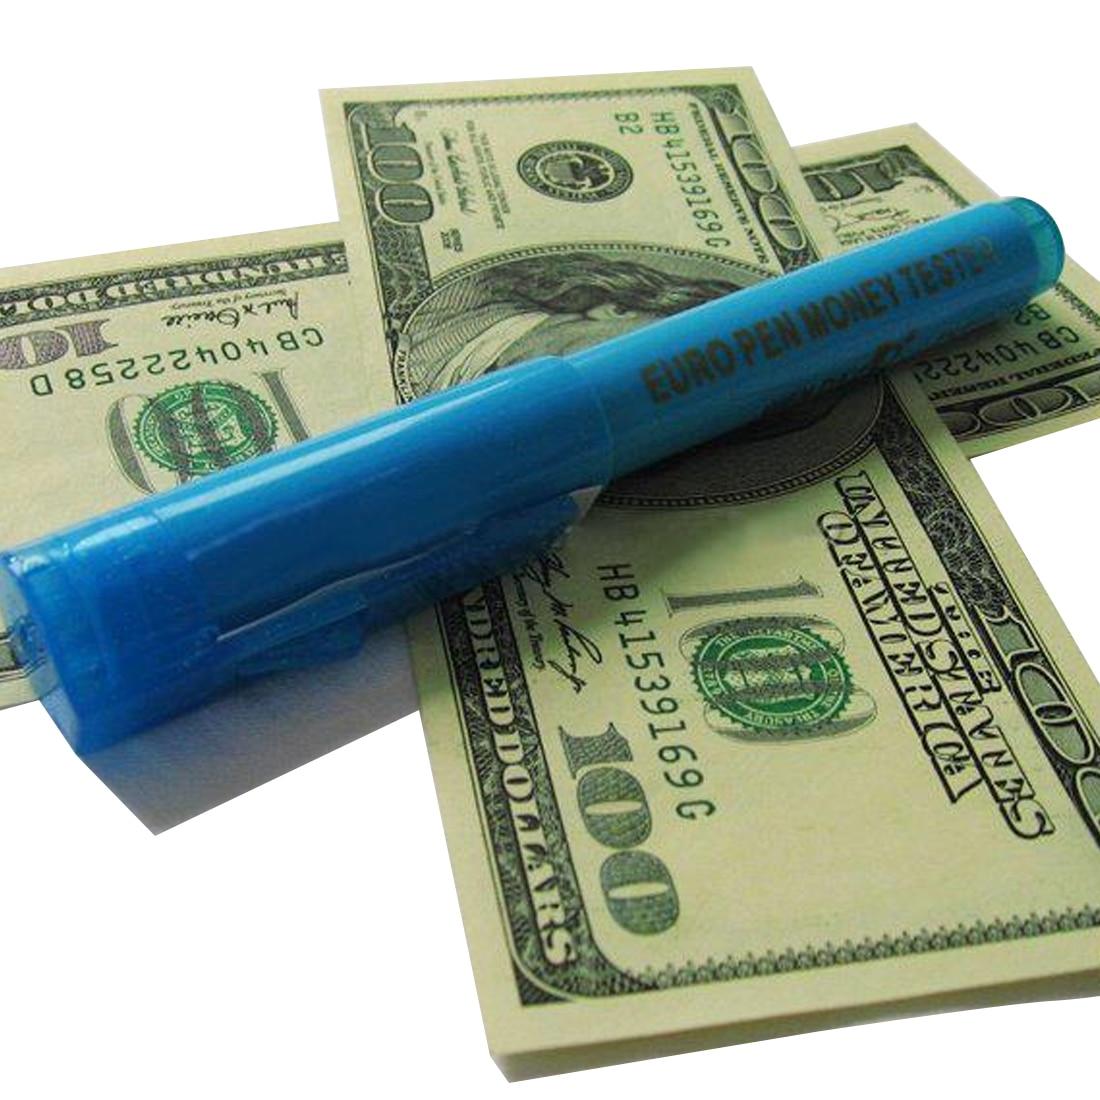 de luz uv falsificado falsificado falsificado dinheiro